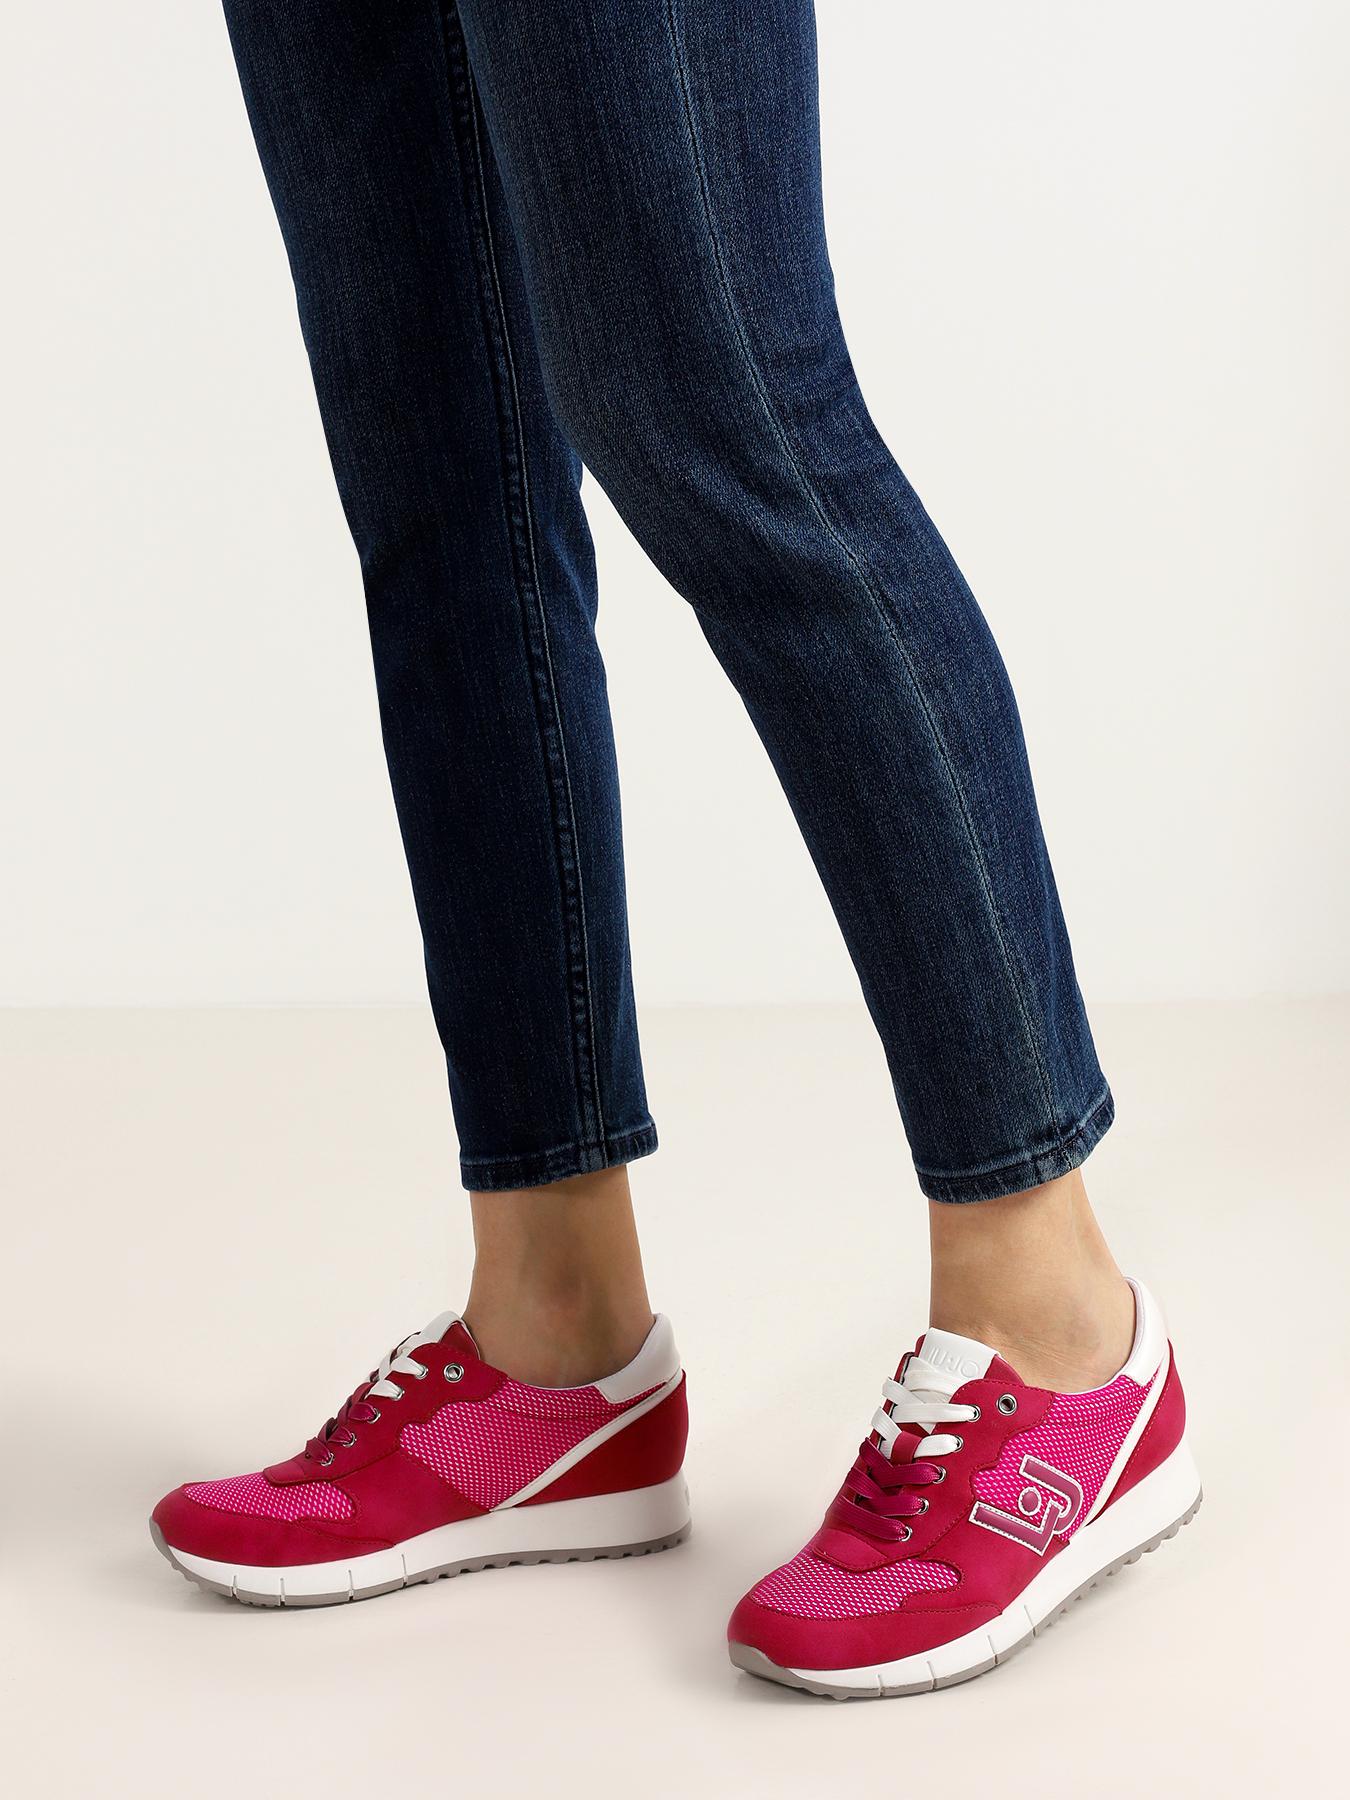 Liu Jo Женские кроссовки от Liu Jo